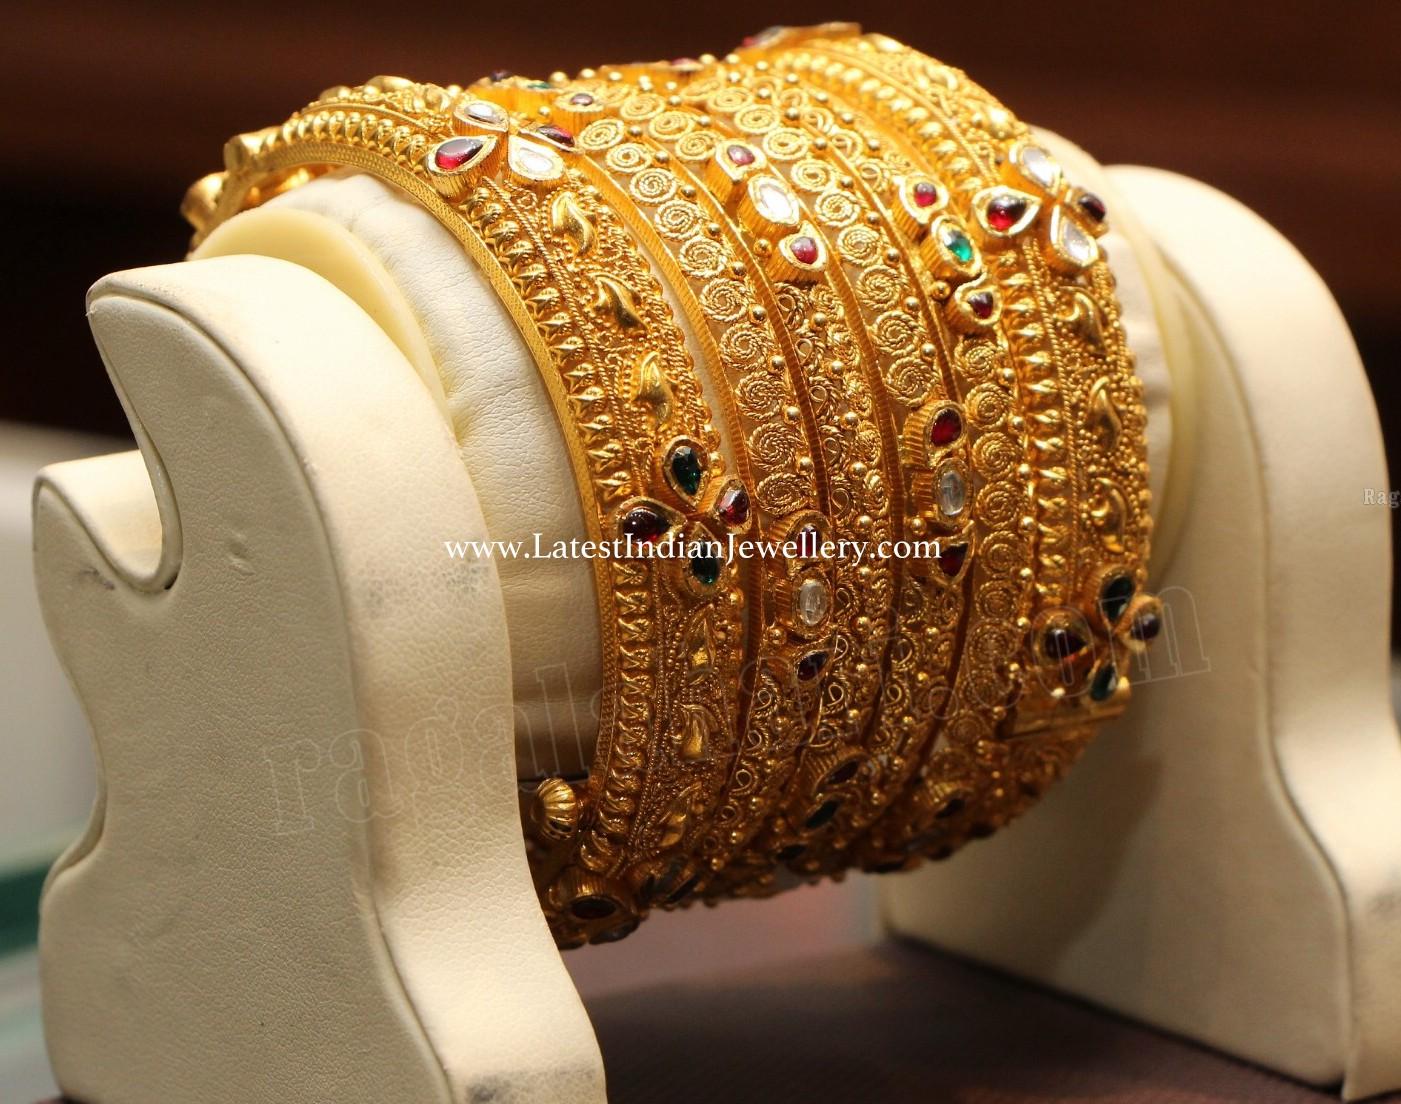 Kundans Studded Gold Bangles